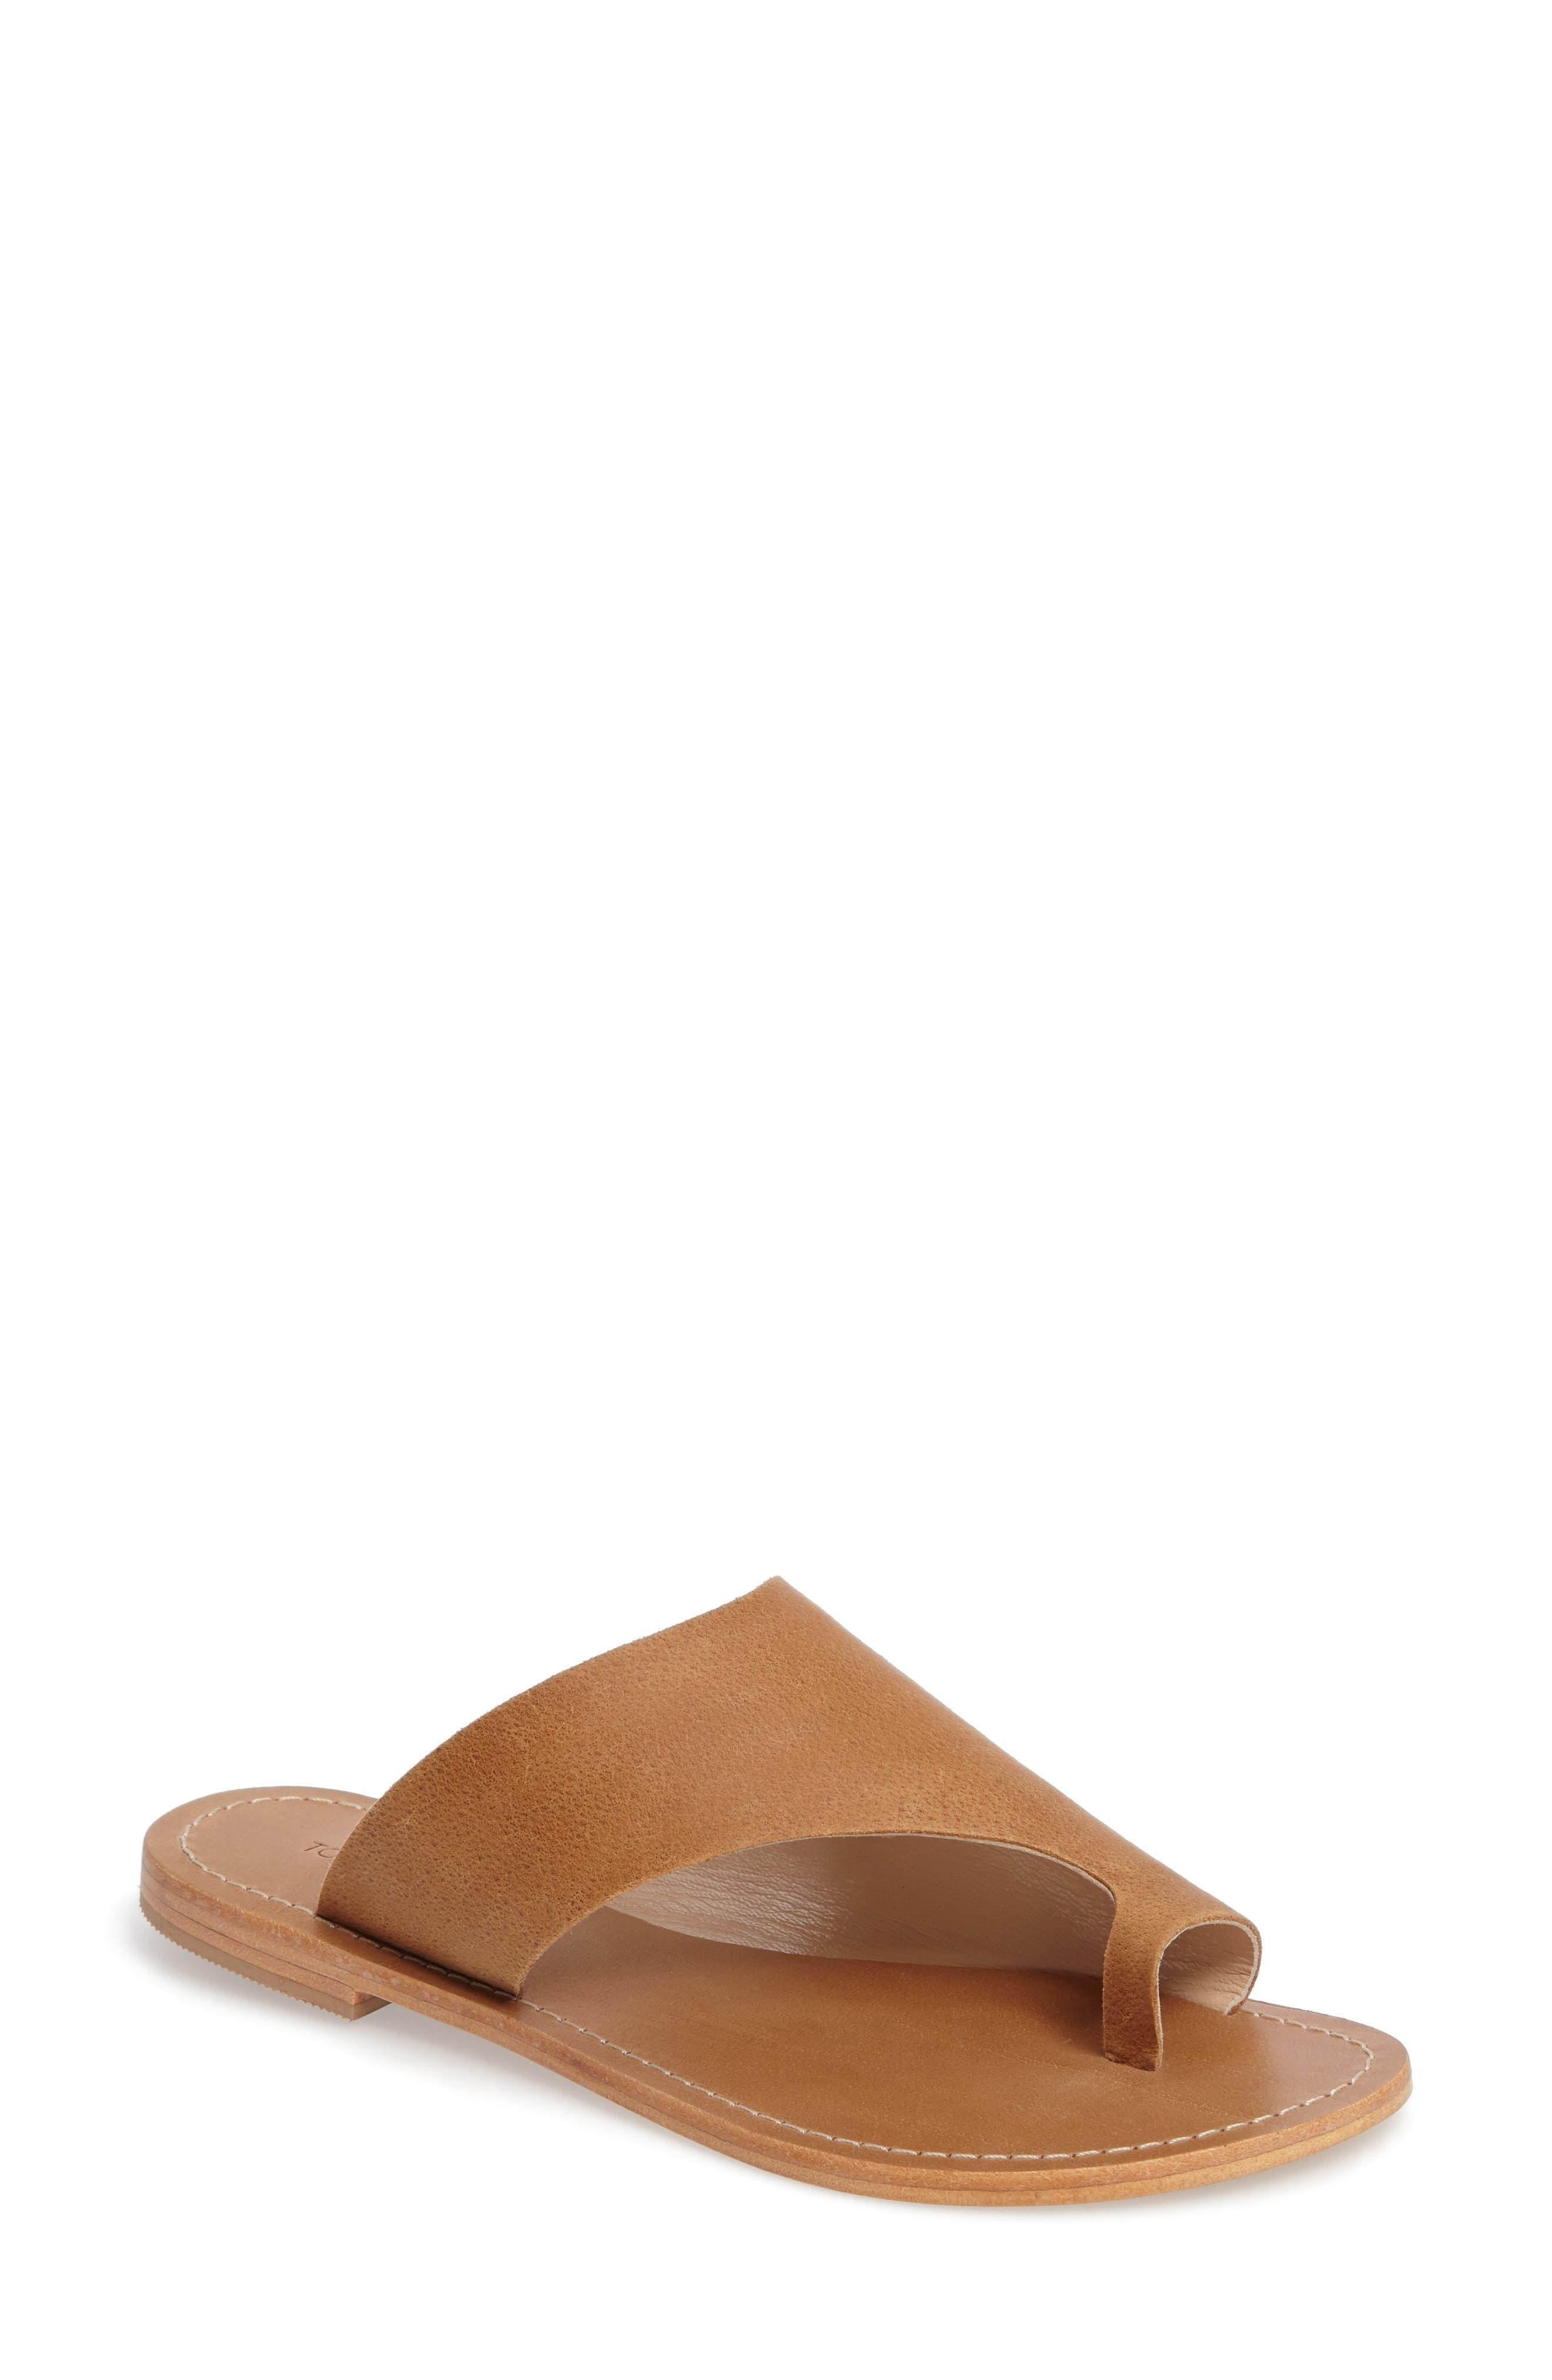 Fleet Slide Sandal,                             Main thumbnail 1, color,                             Tan Leather